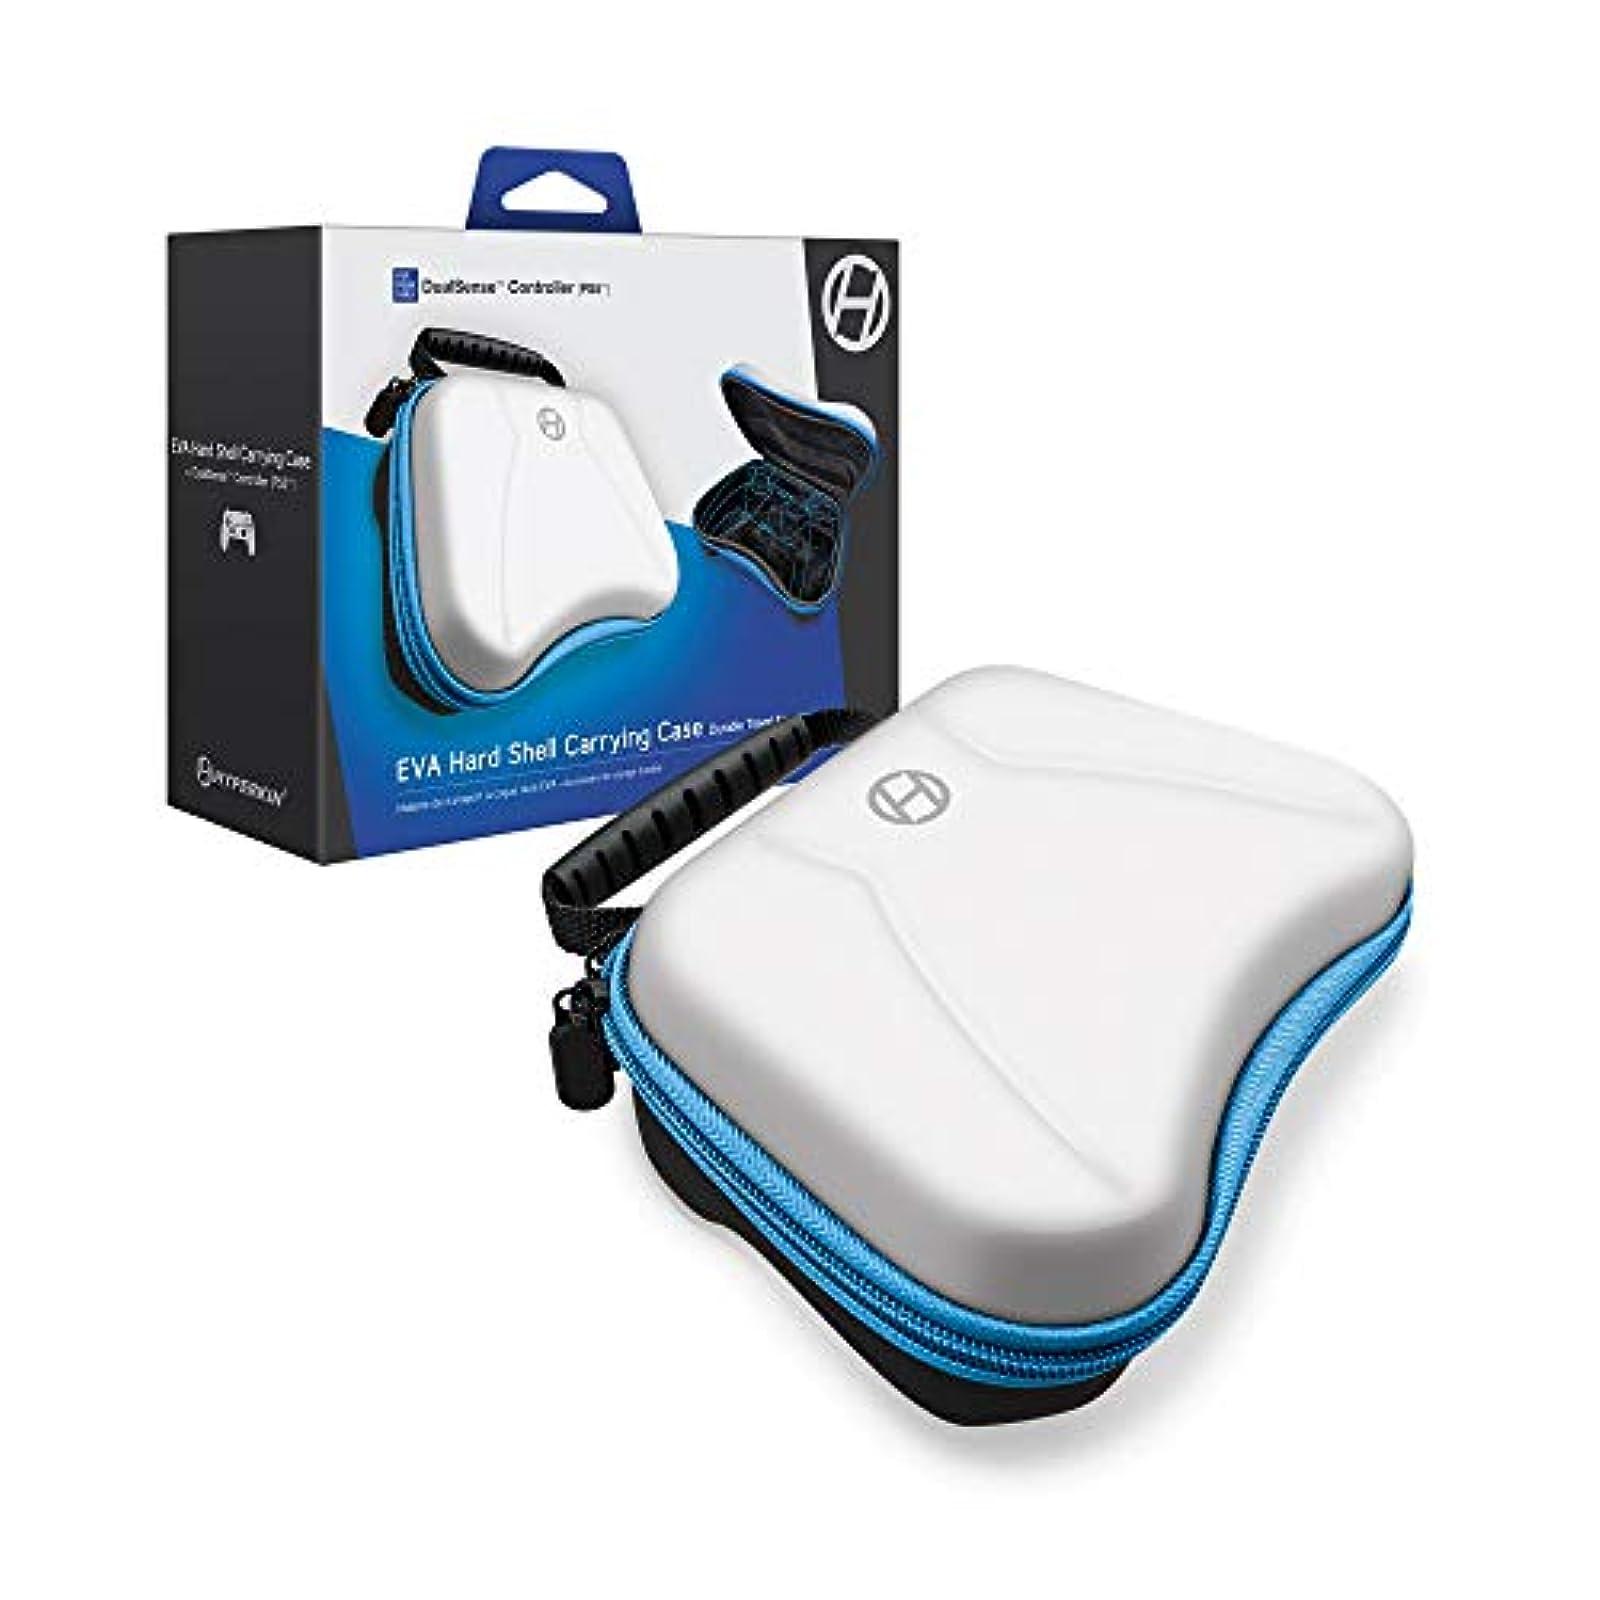 Hyperkin Eva Hard Shell Carrying Case For Dualsense PS5 White PlayStation 5